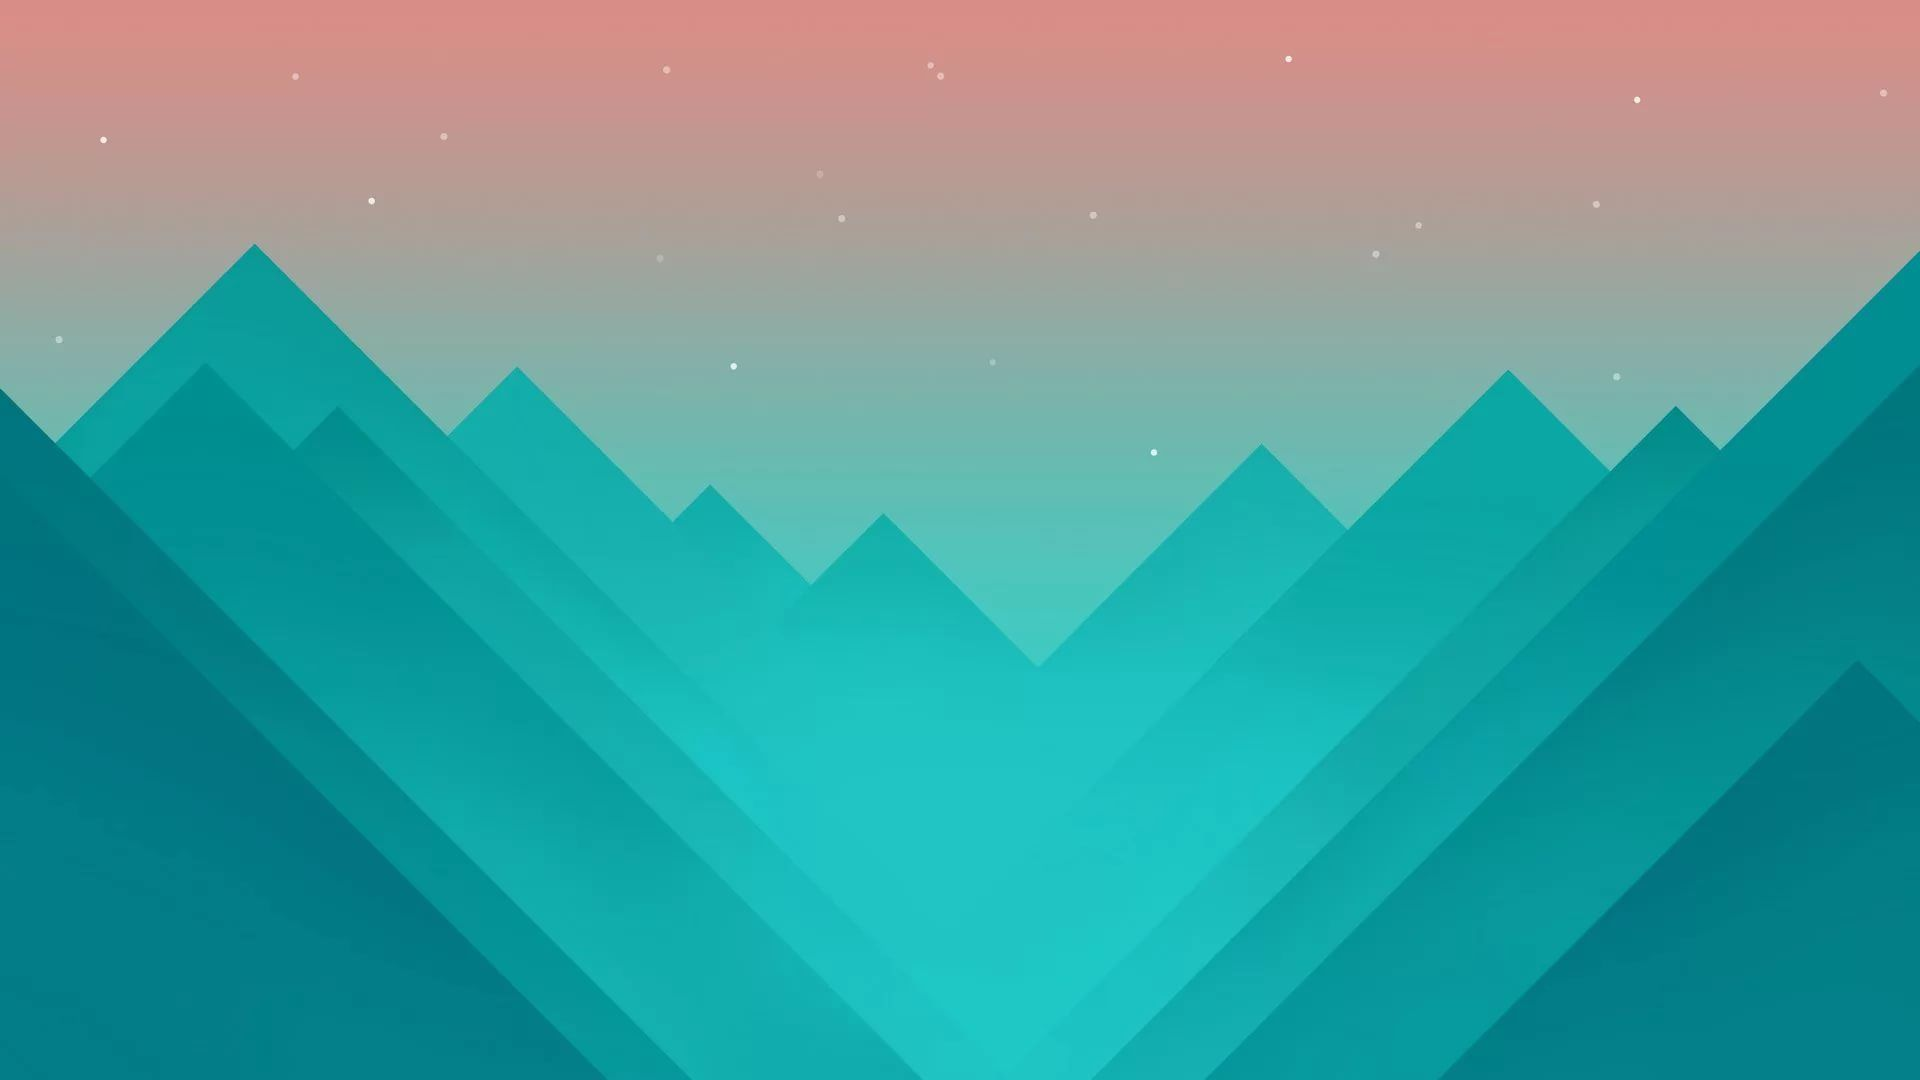 Flat background wallpaper